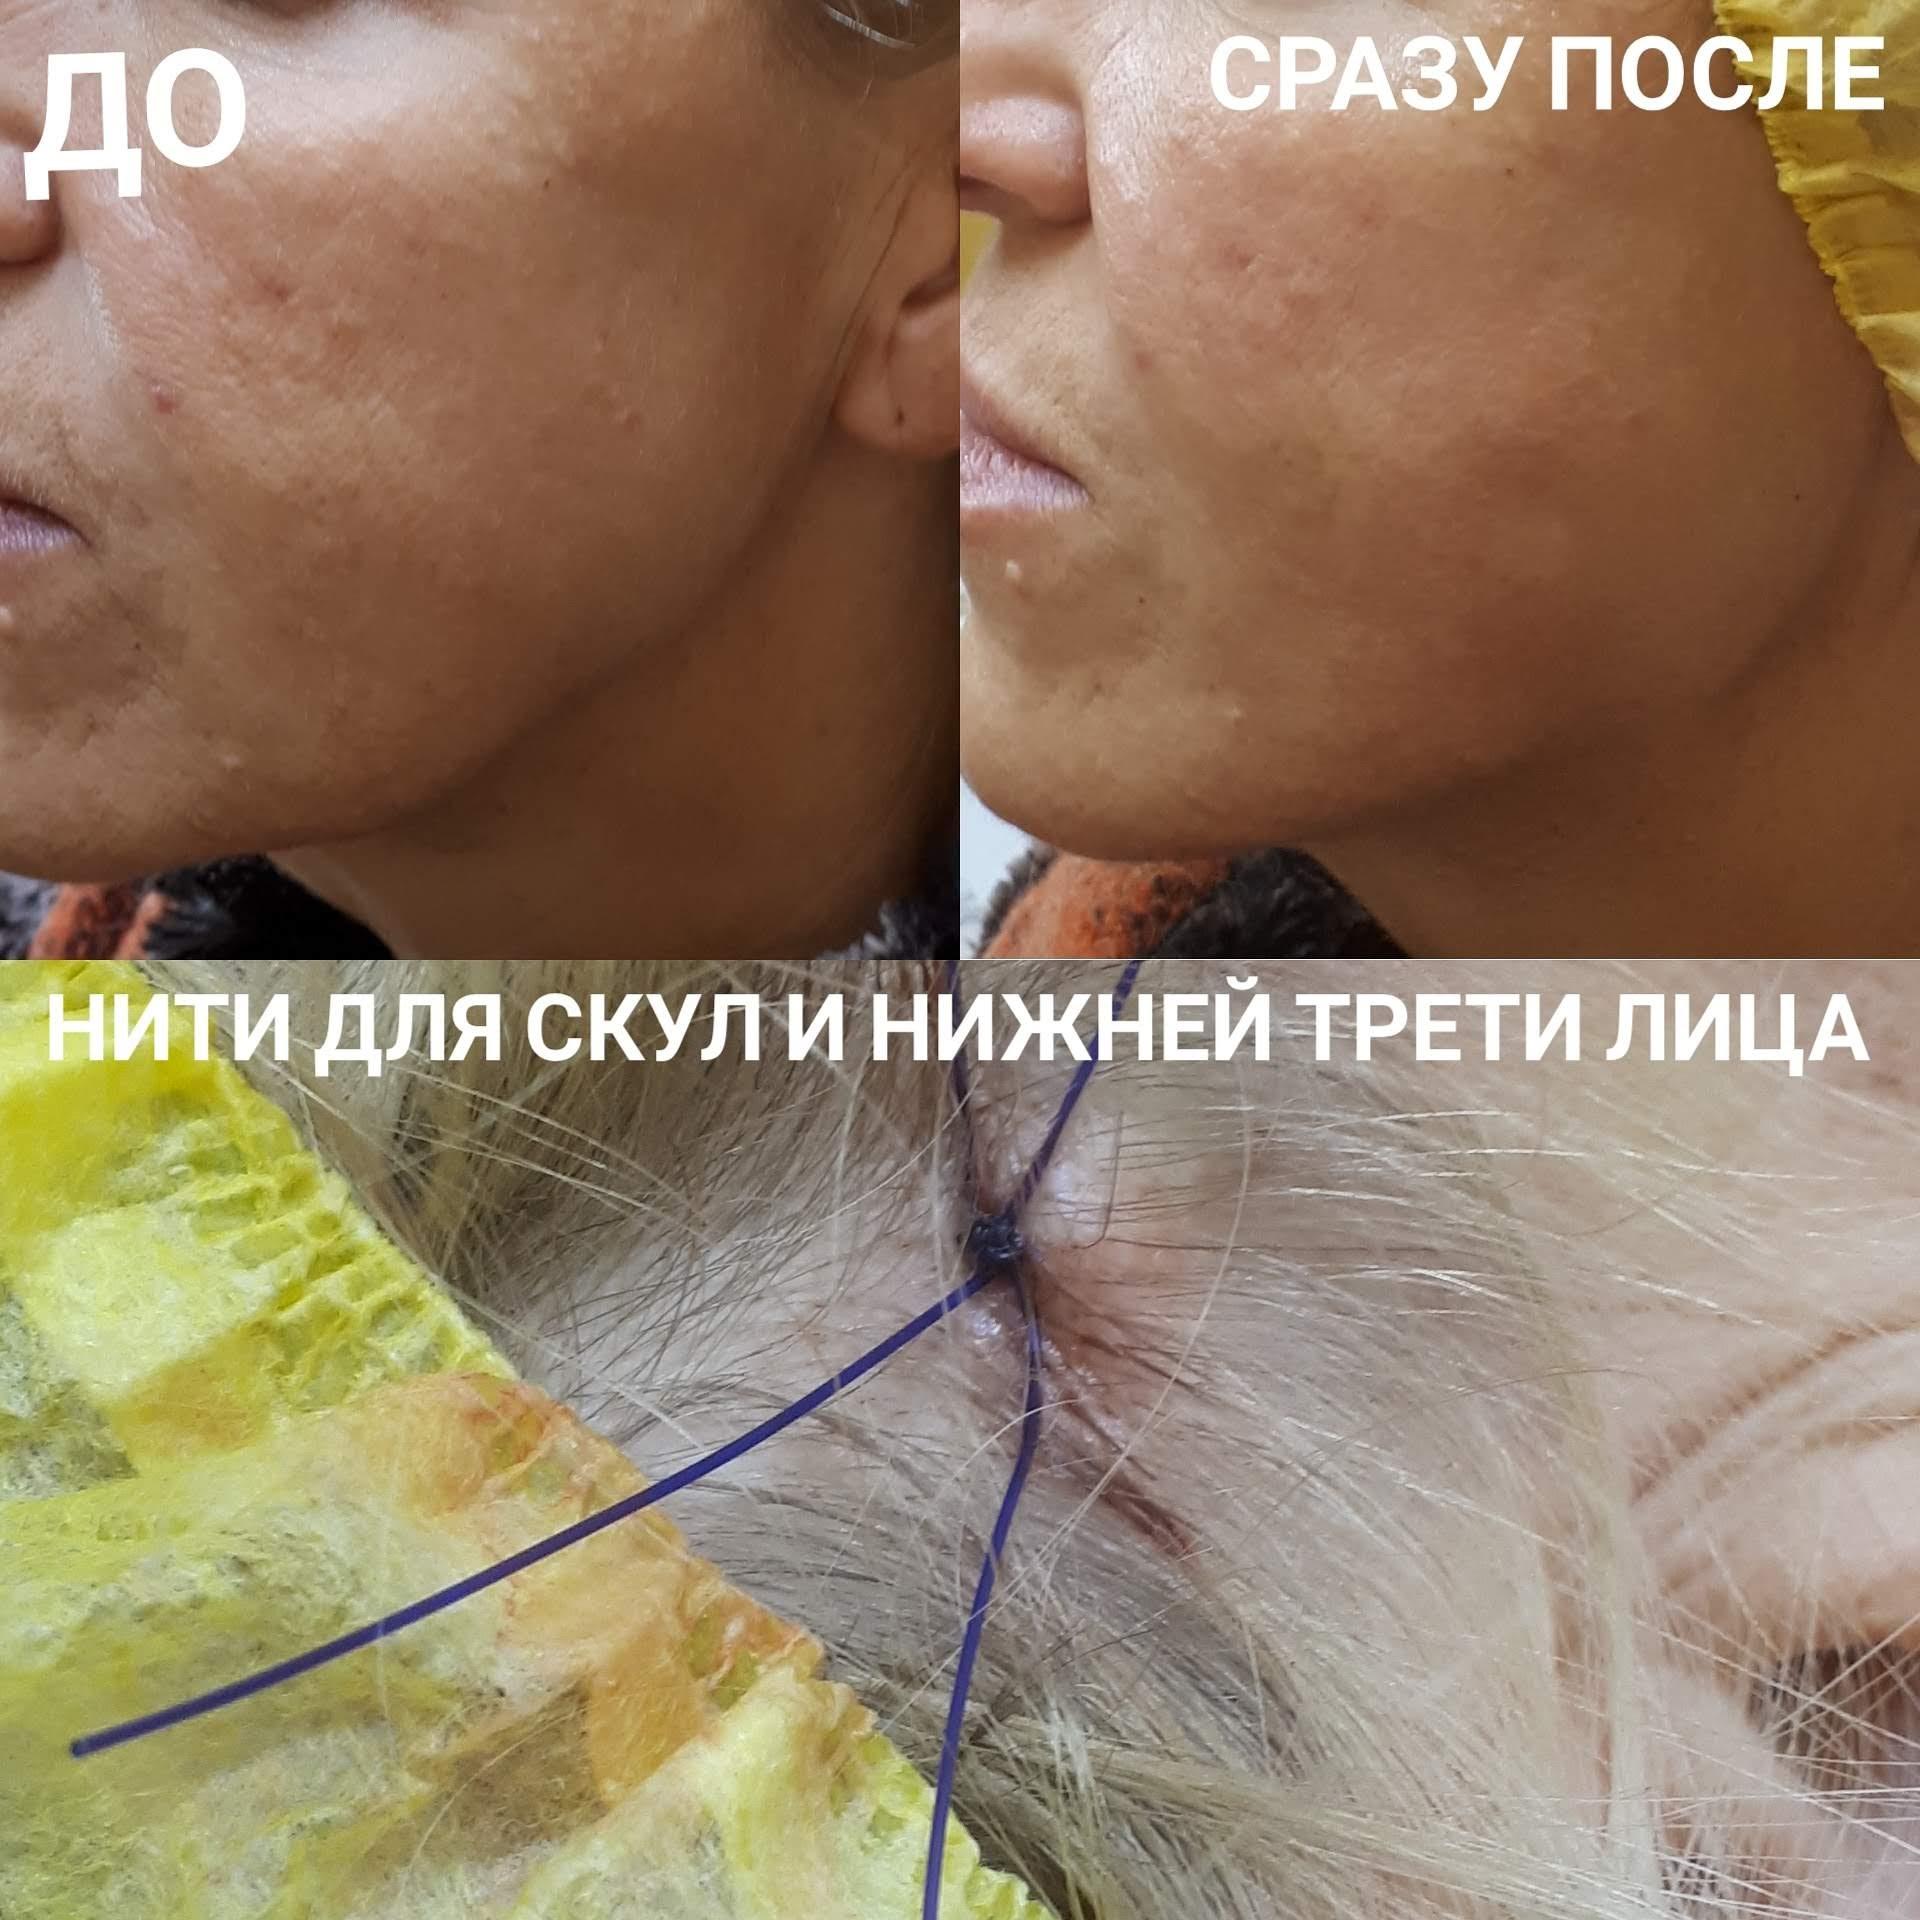 IMG_20181109_203245_756